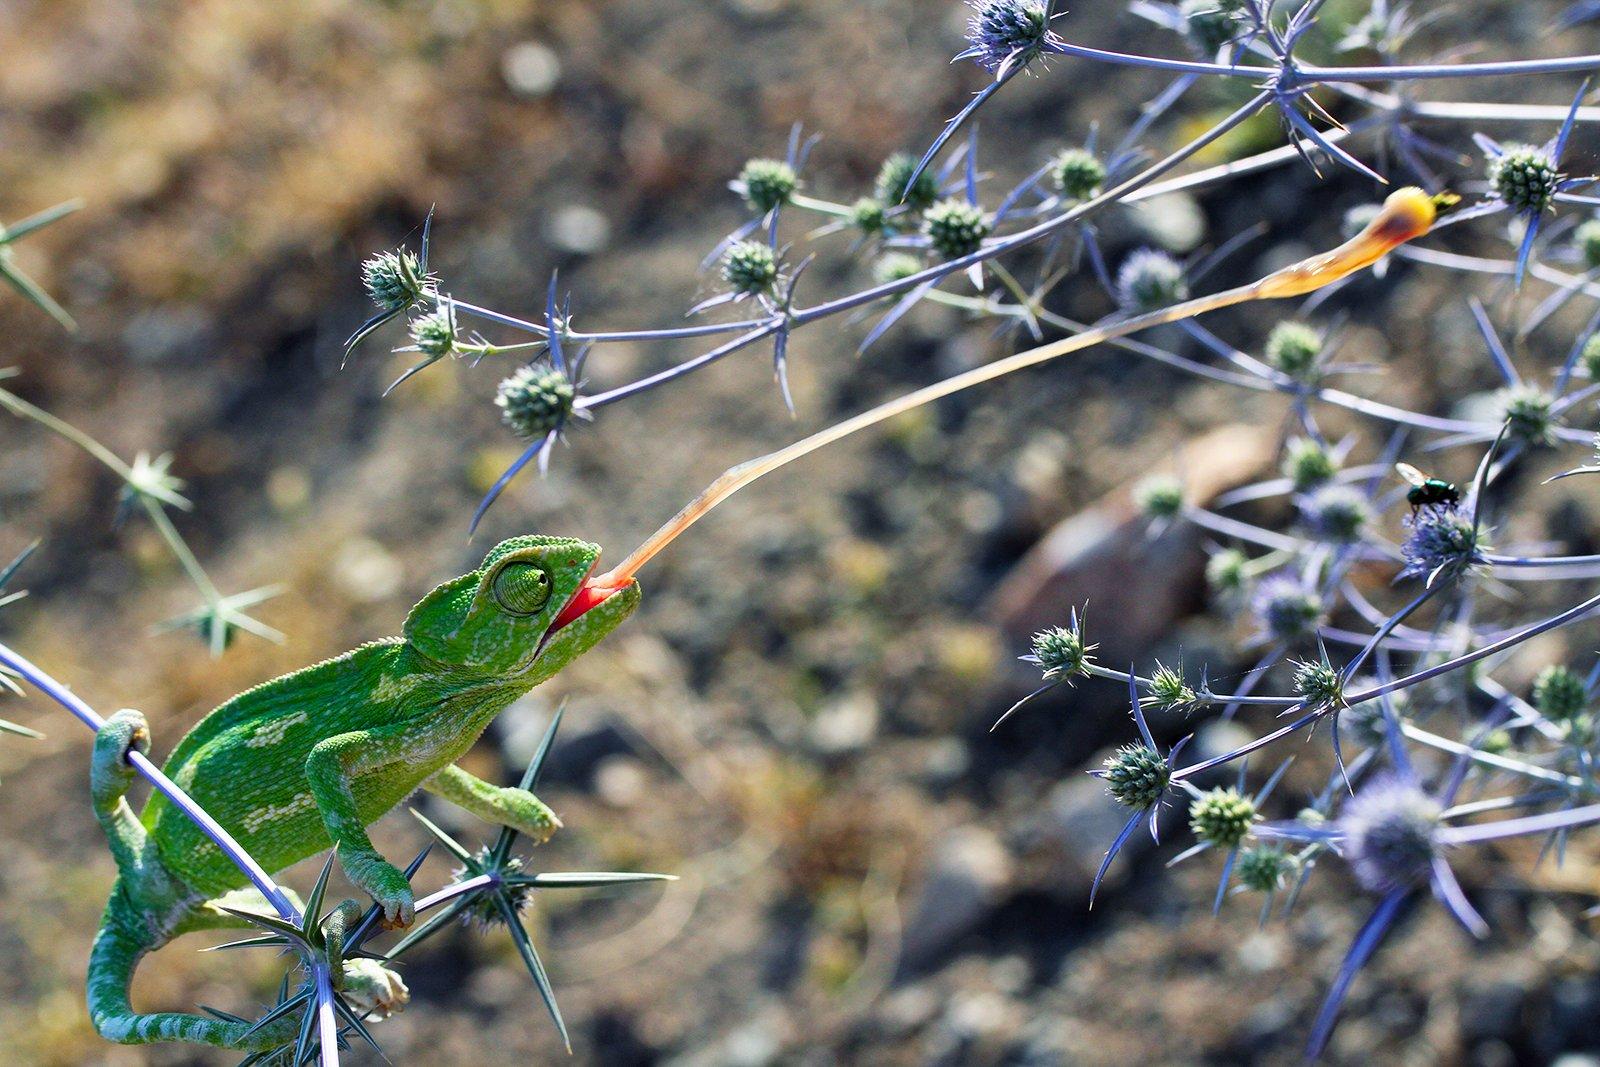 chameleon nature animals, mehmet